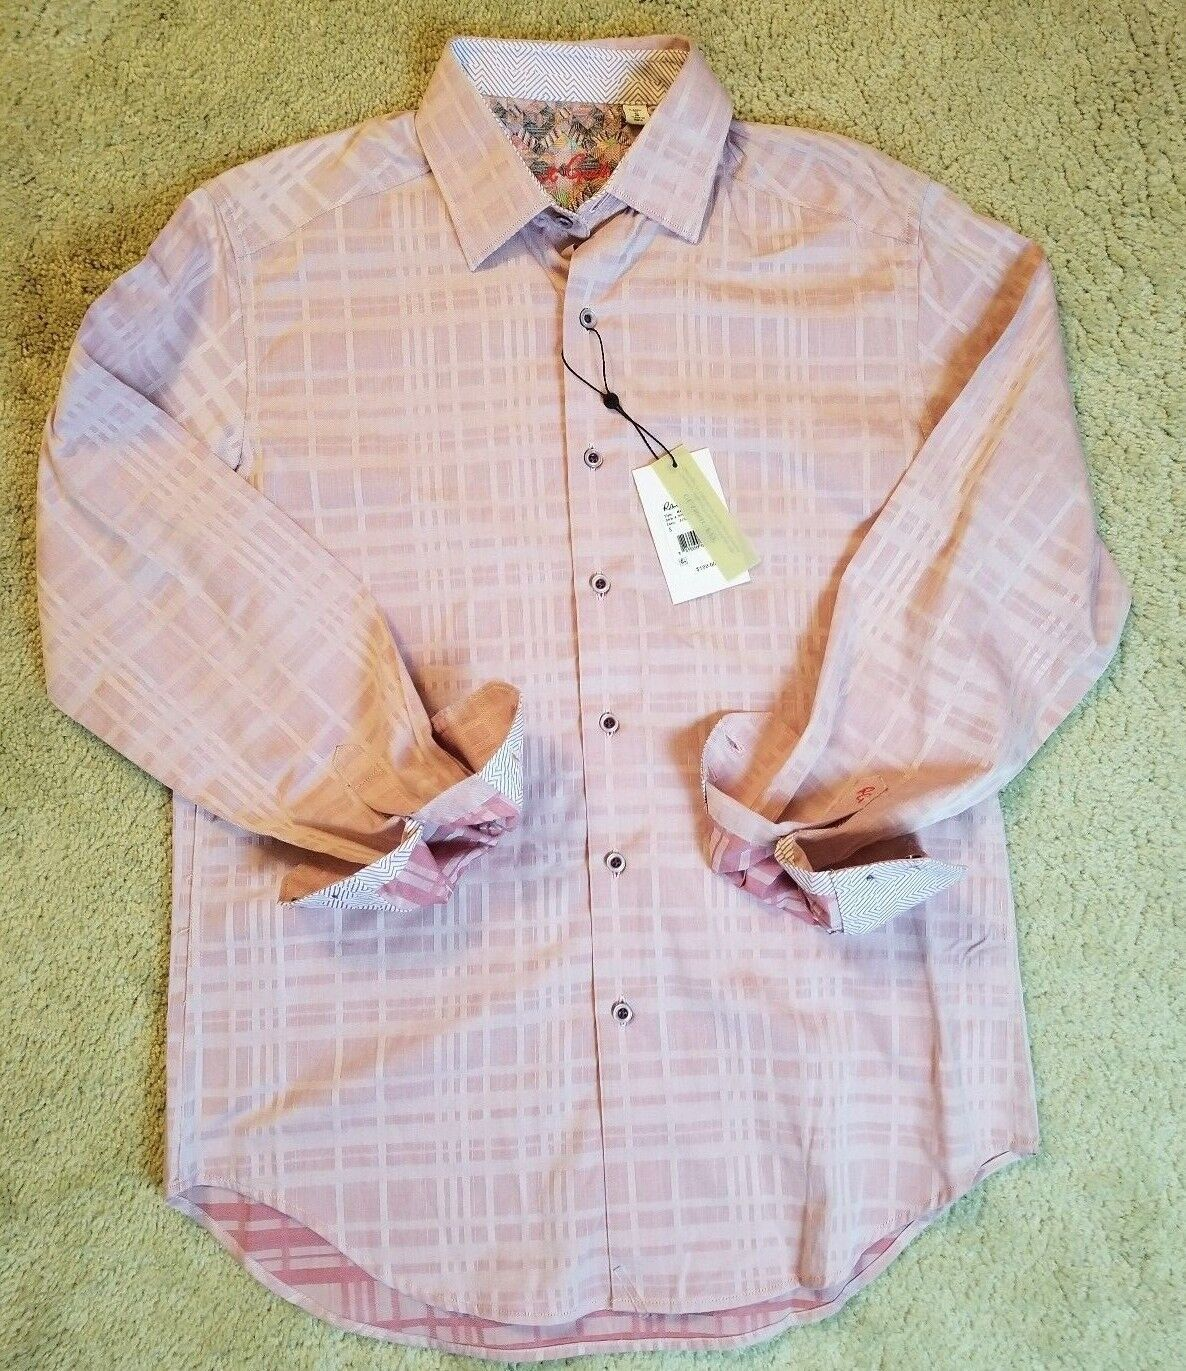 NWT Herren ROBERT GRAHAM BERRY MANUREWA DRESS SHIRT SIZE SMALL NEW MSRP 198